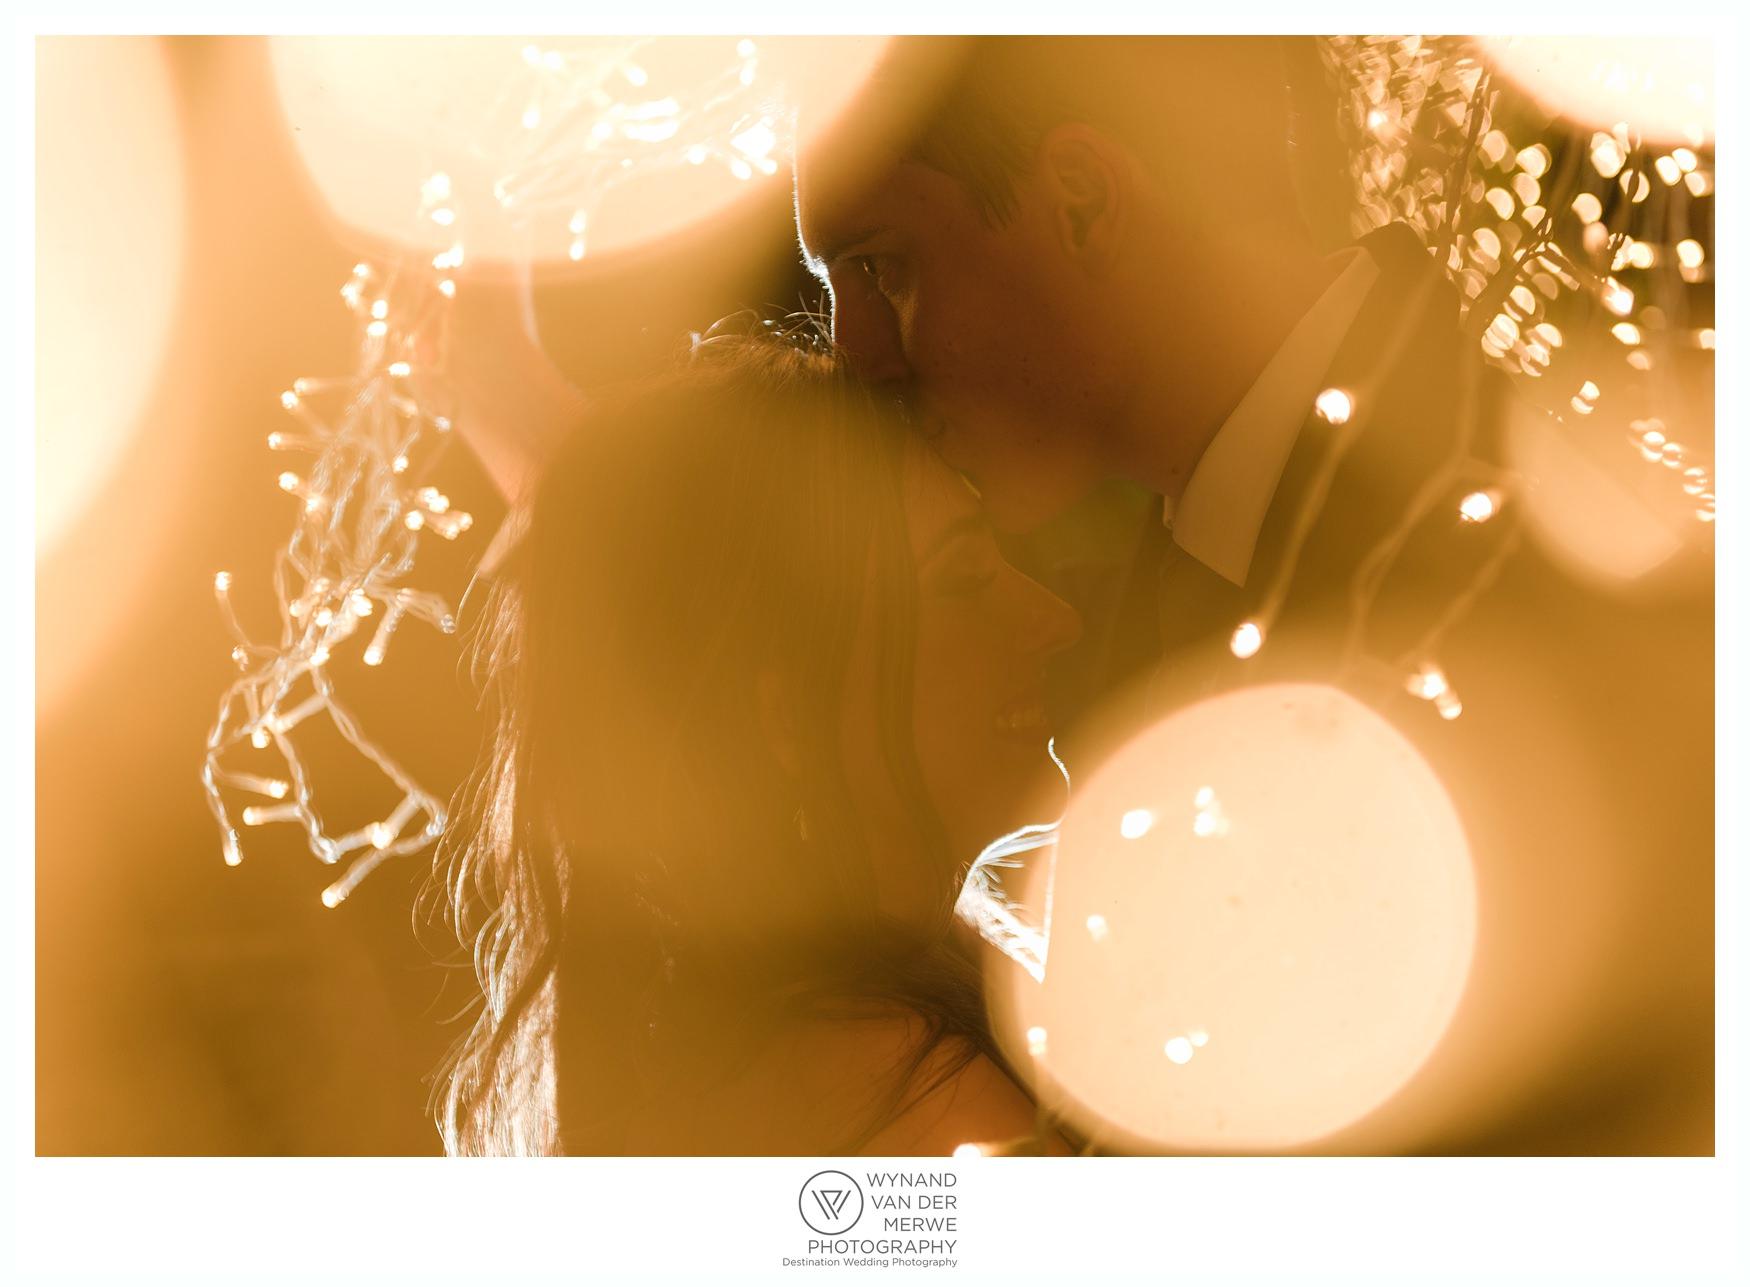 Wynandvandermerwe ryan natalia wedding photography cradle valley guesthouse gauteng-39.jpg